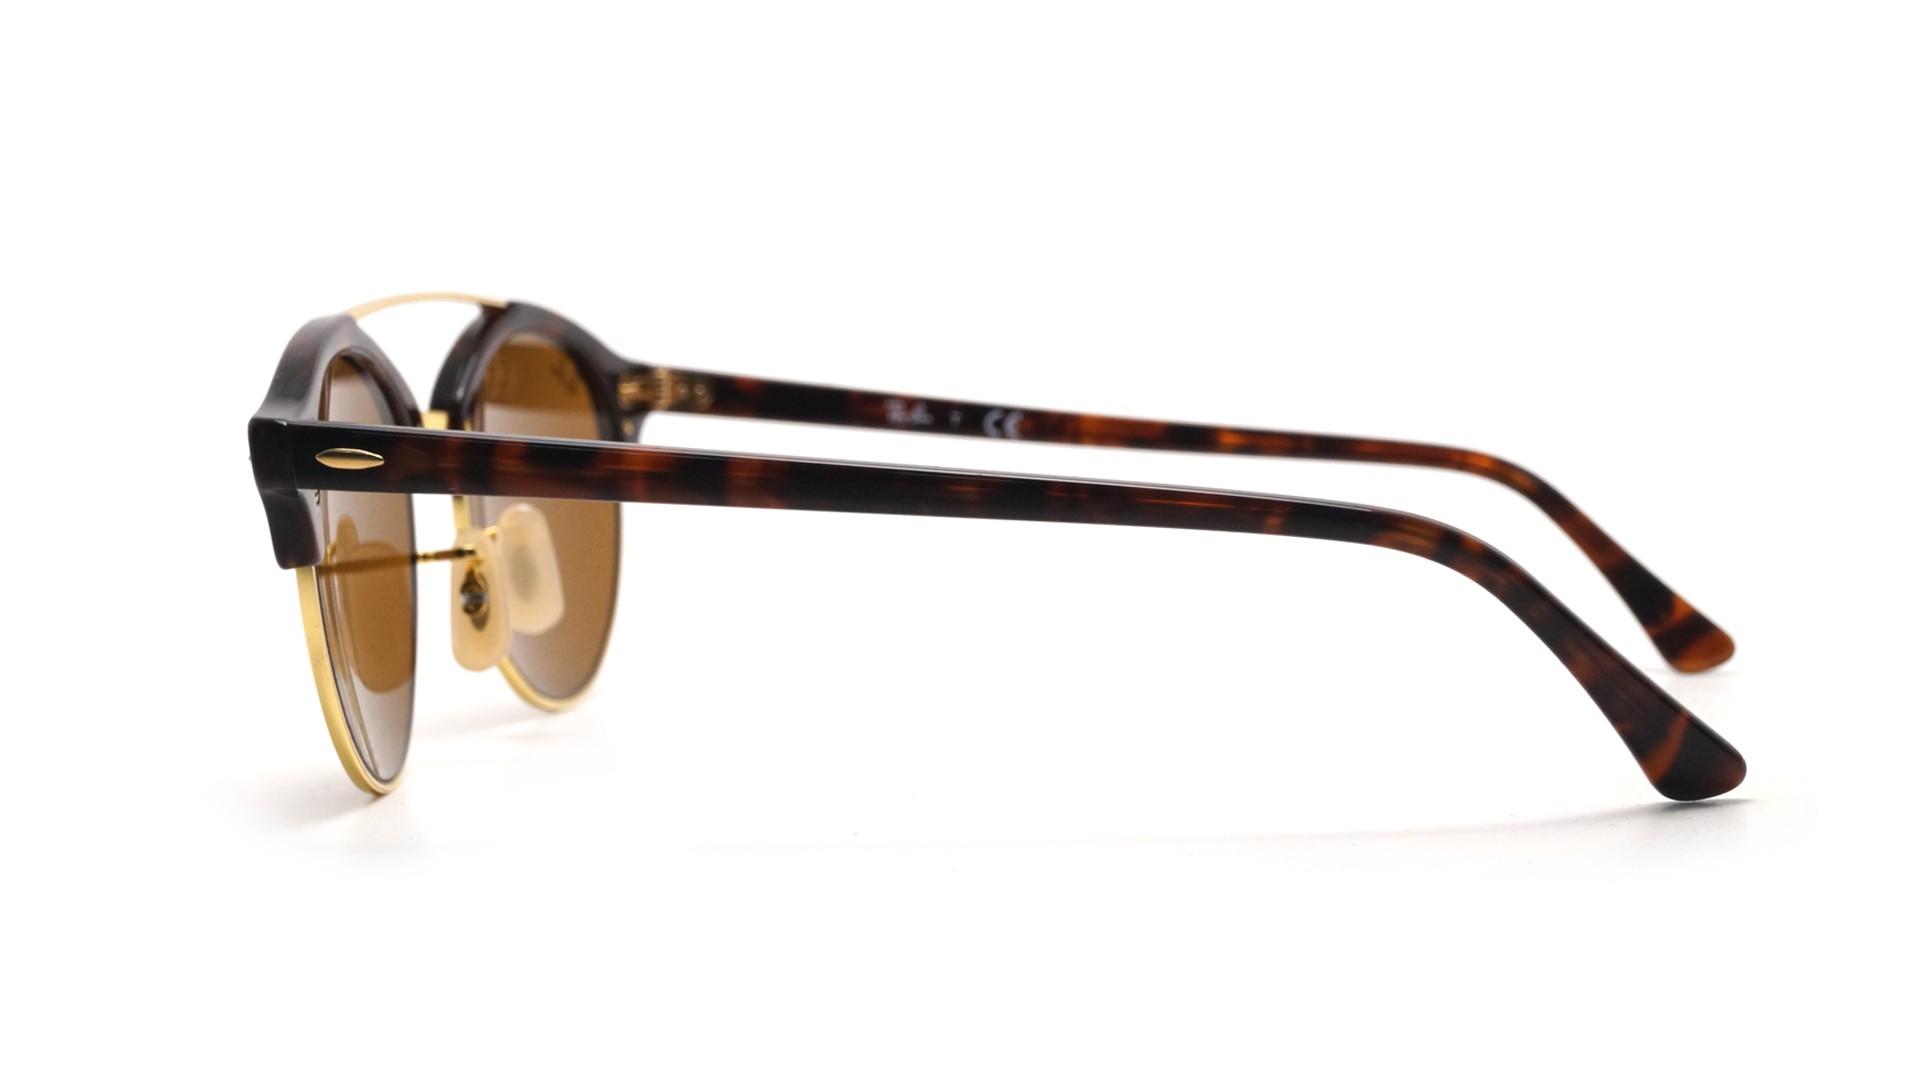 e4da903c51 Sunglasses Ray-Ban Clubround double bridge Tortoise RB4346 990 33 51-19  Medium